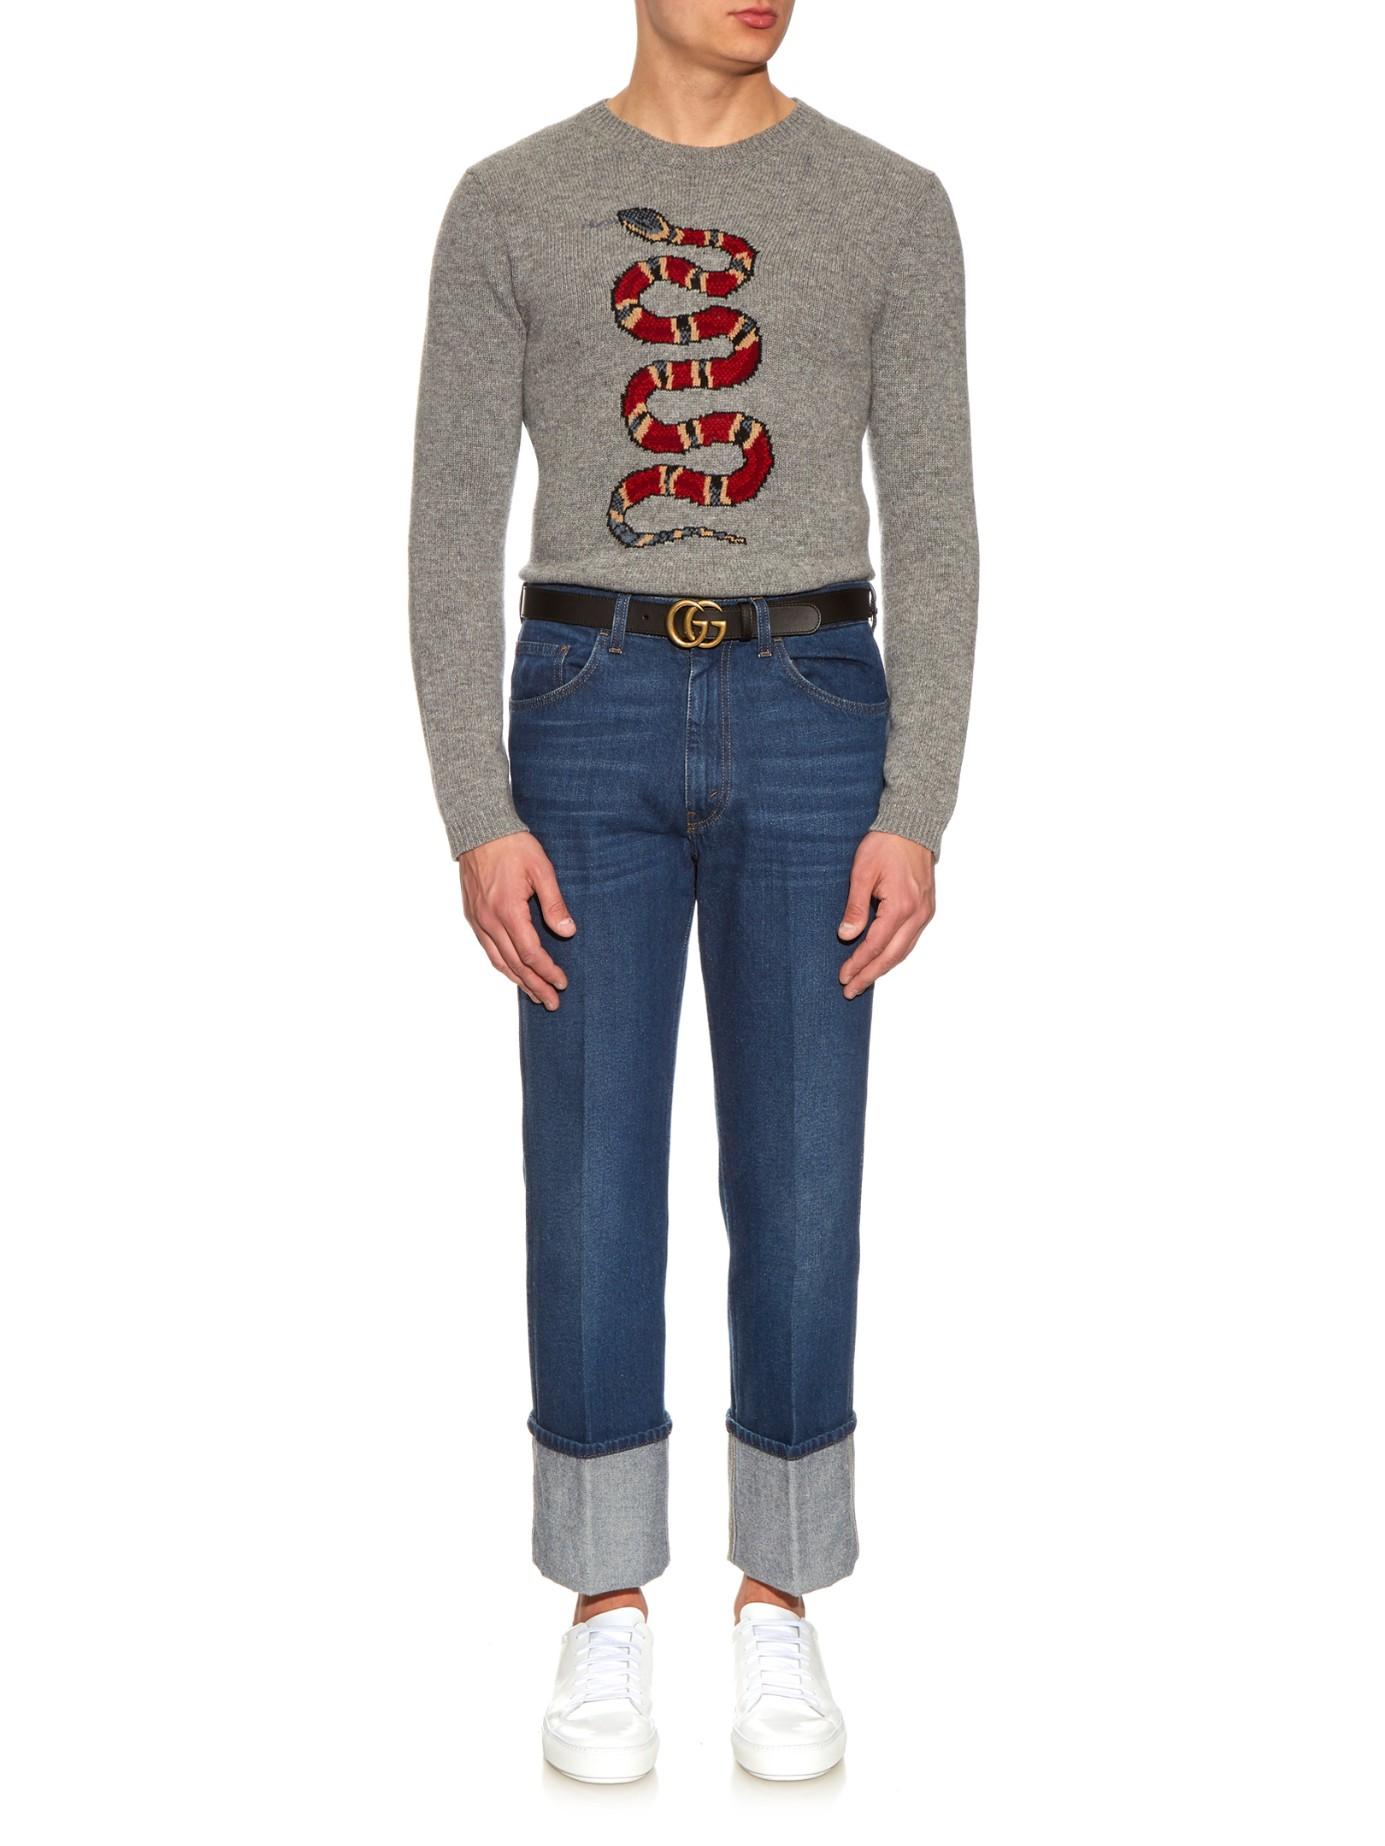 Cheap Silver Jeans For Men